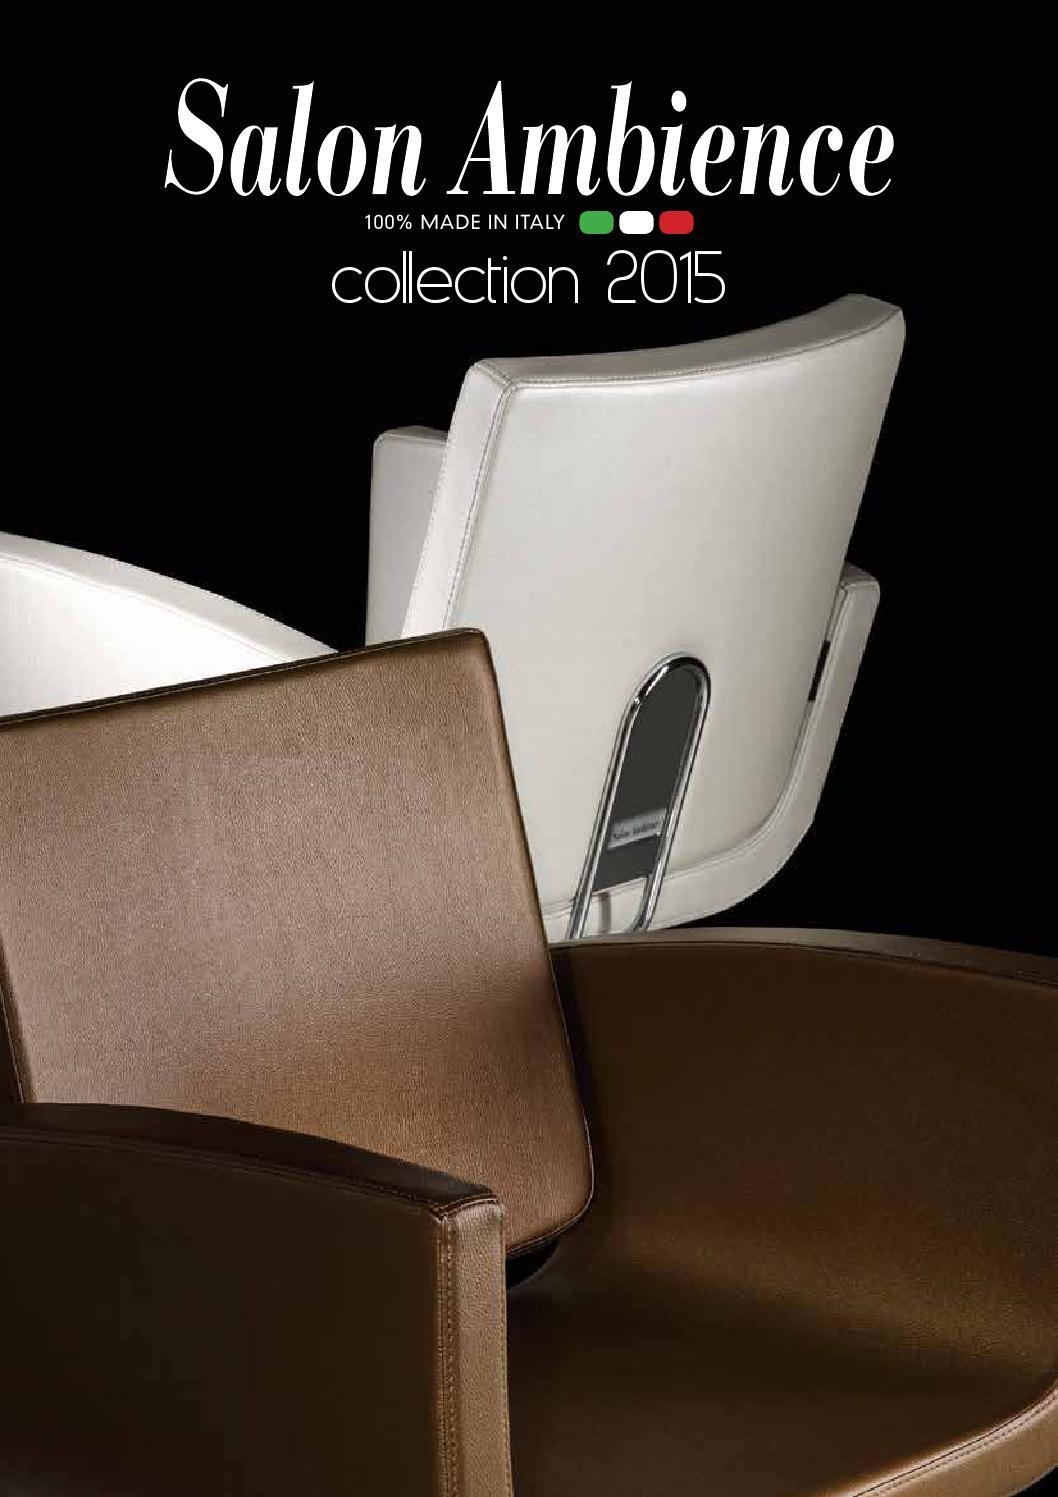 Panneau Melamine Noir Mat salon ambience 2015 collectionkris dade - issuu